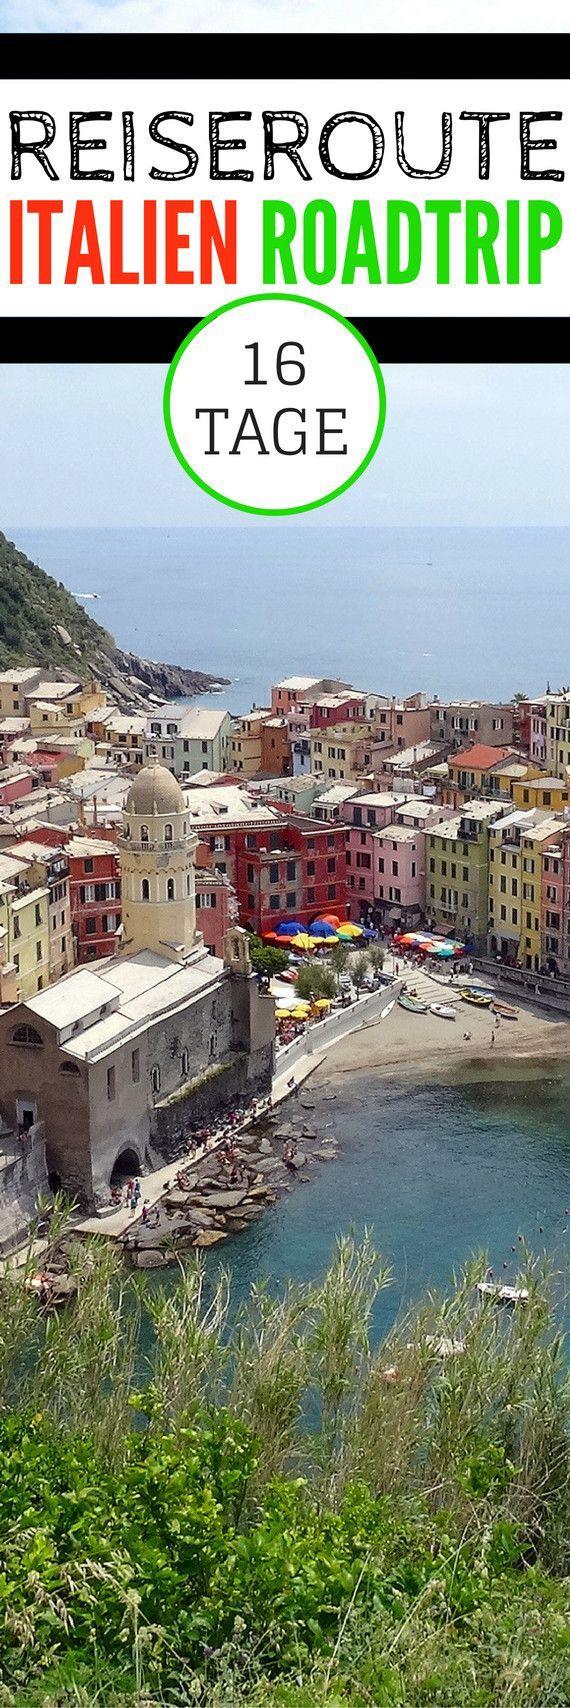 Reiseroute - 16 Tage mit dem Auto durch Italien #campingideas